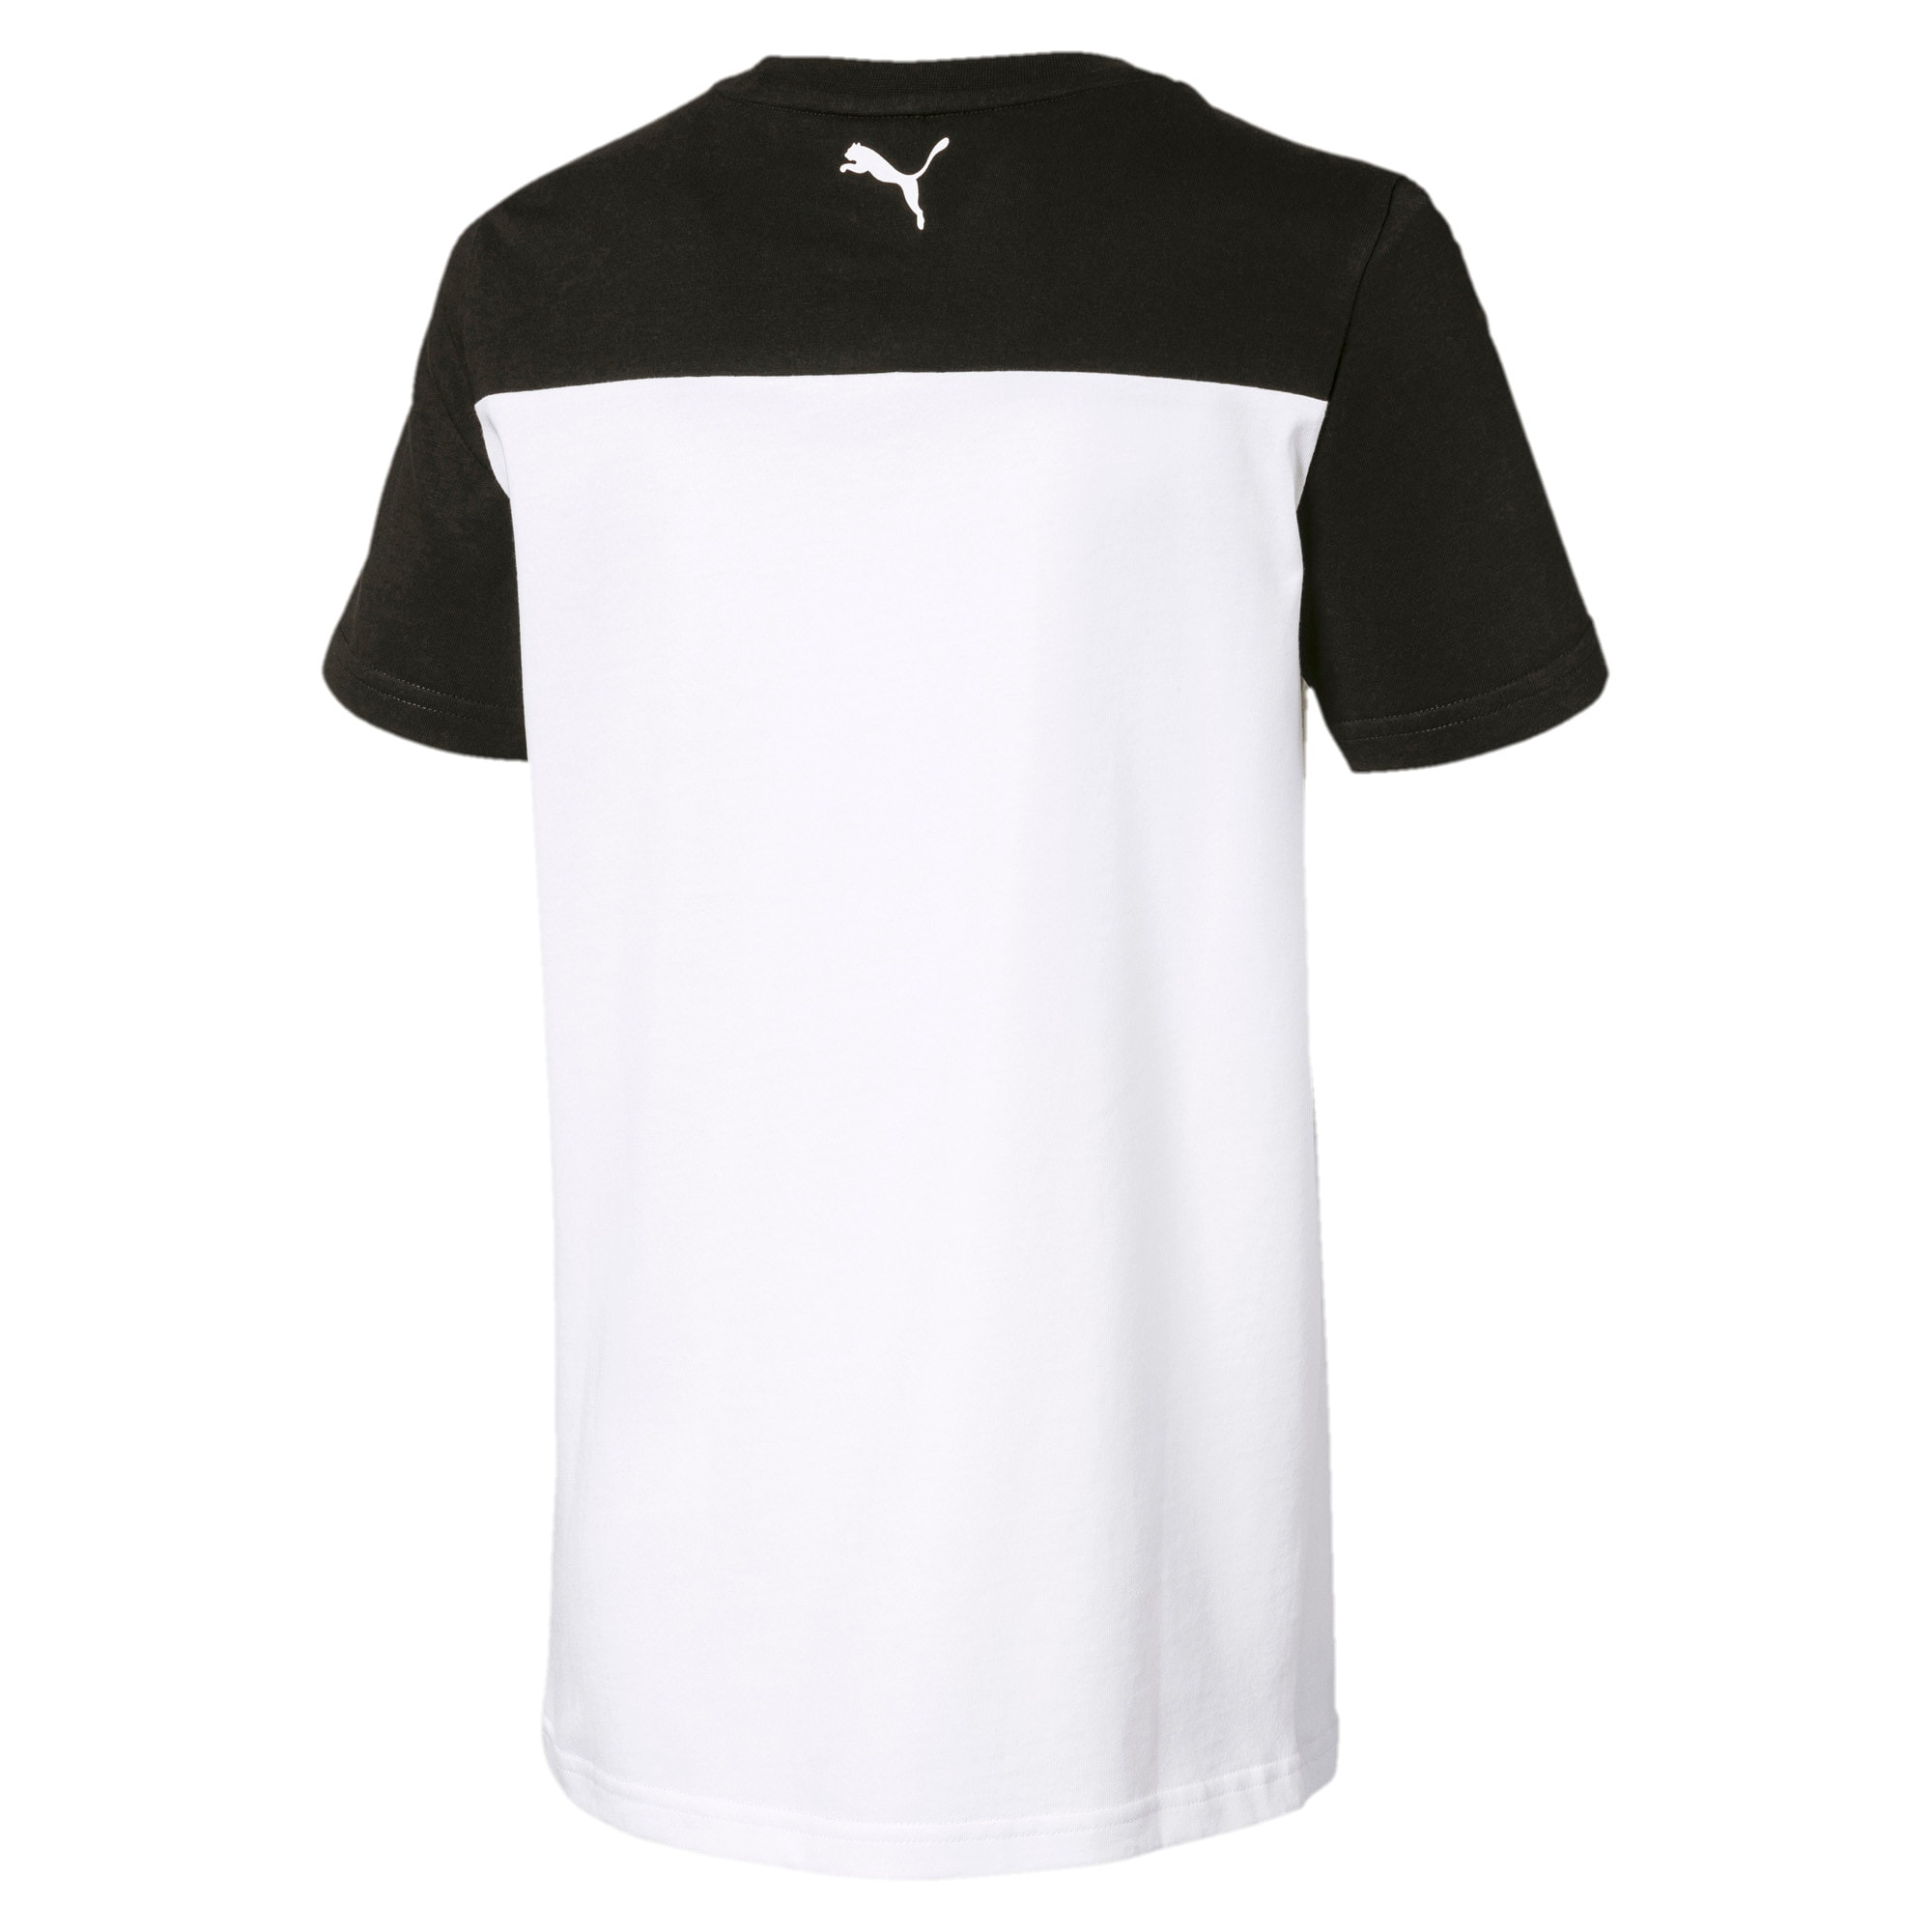 Thumbnail 2 of キッズ ALPHA SS トレンド Tシャツ 半袖, Puma Black, medium-JPN